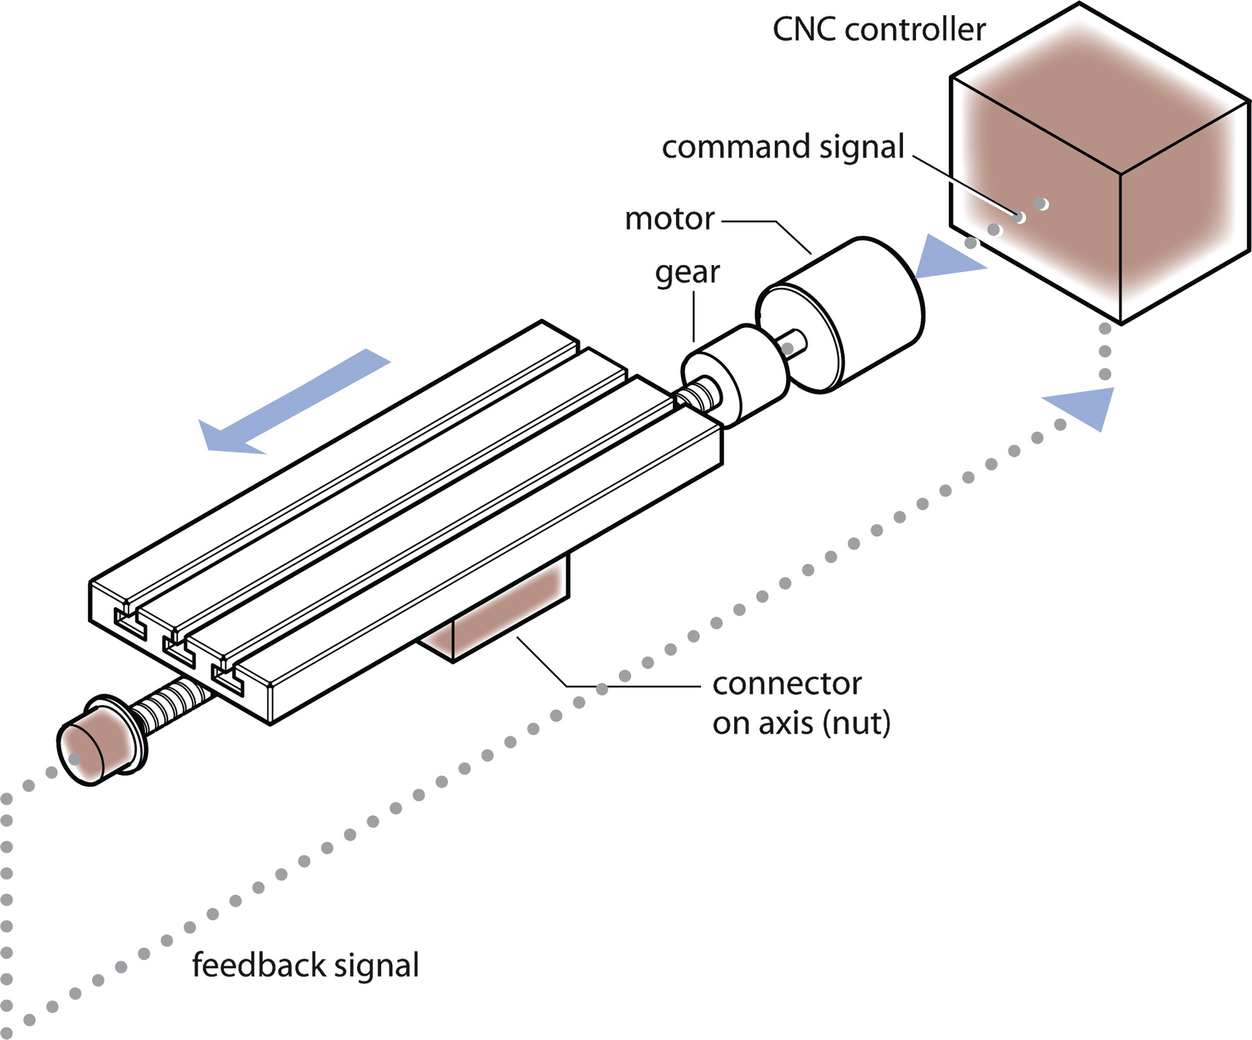 3 axis mill diagram machine tool springerlink  machine tool springerlink